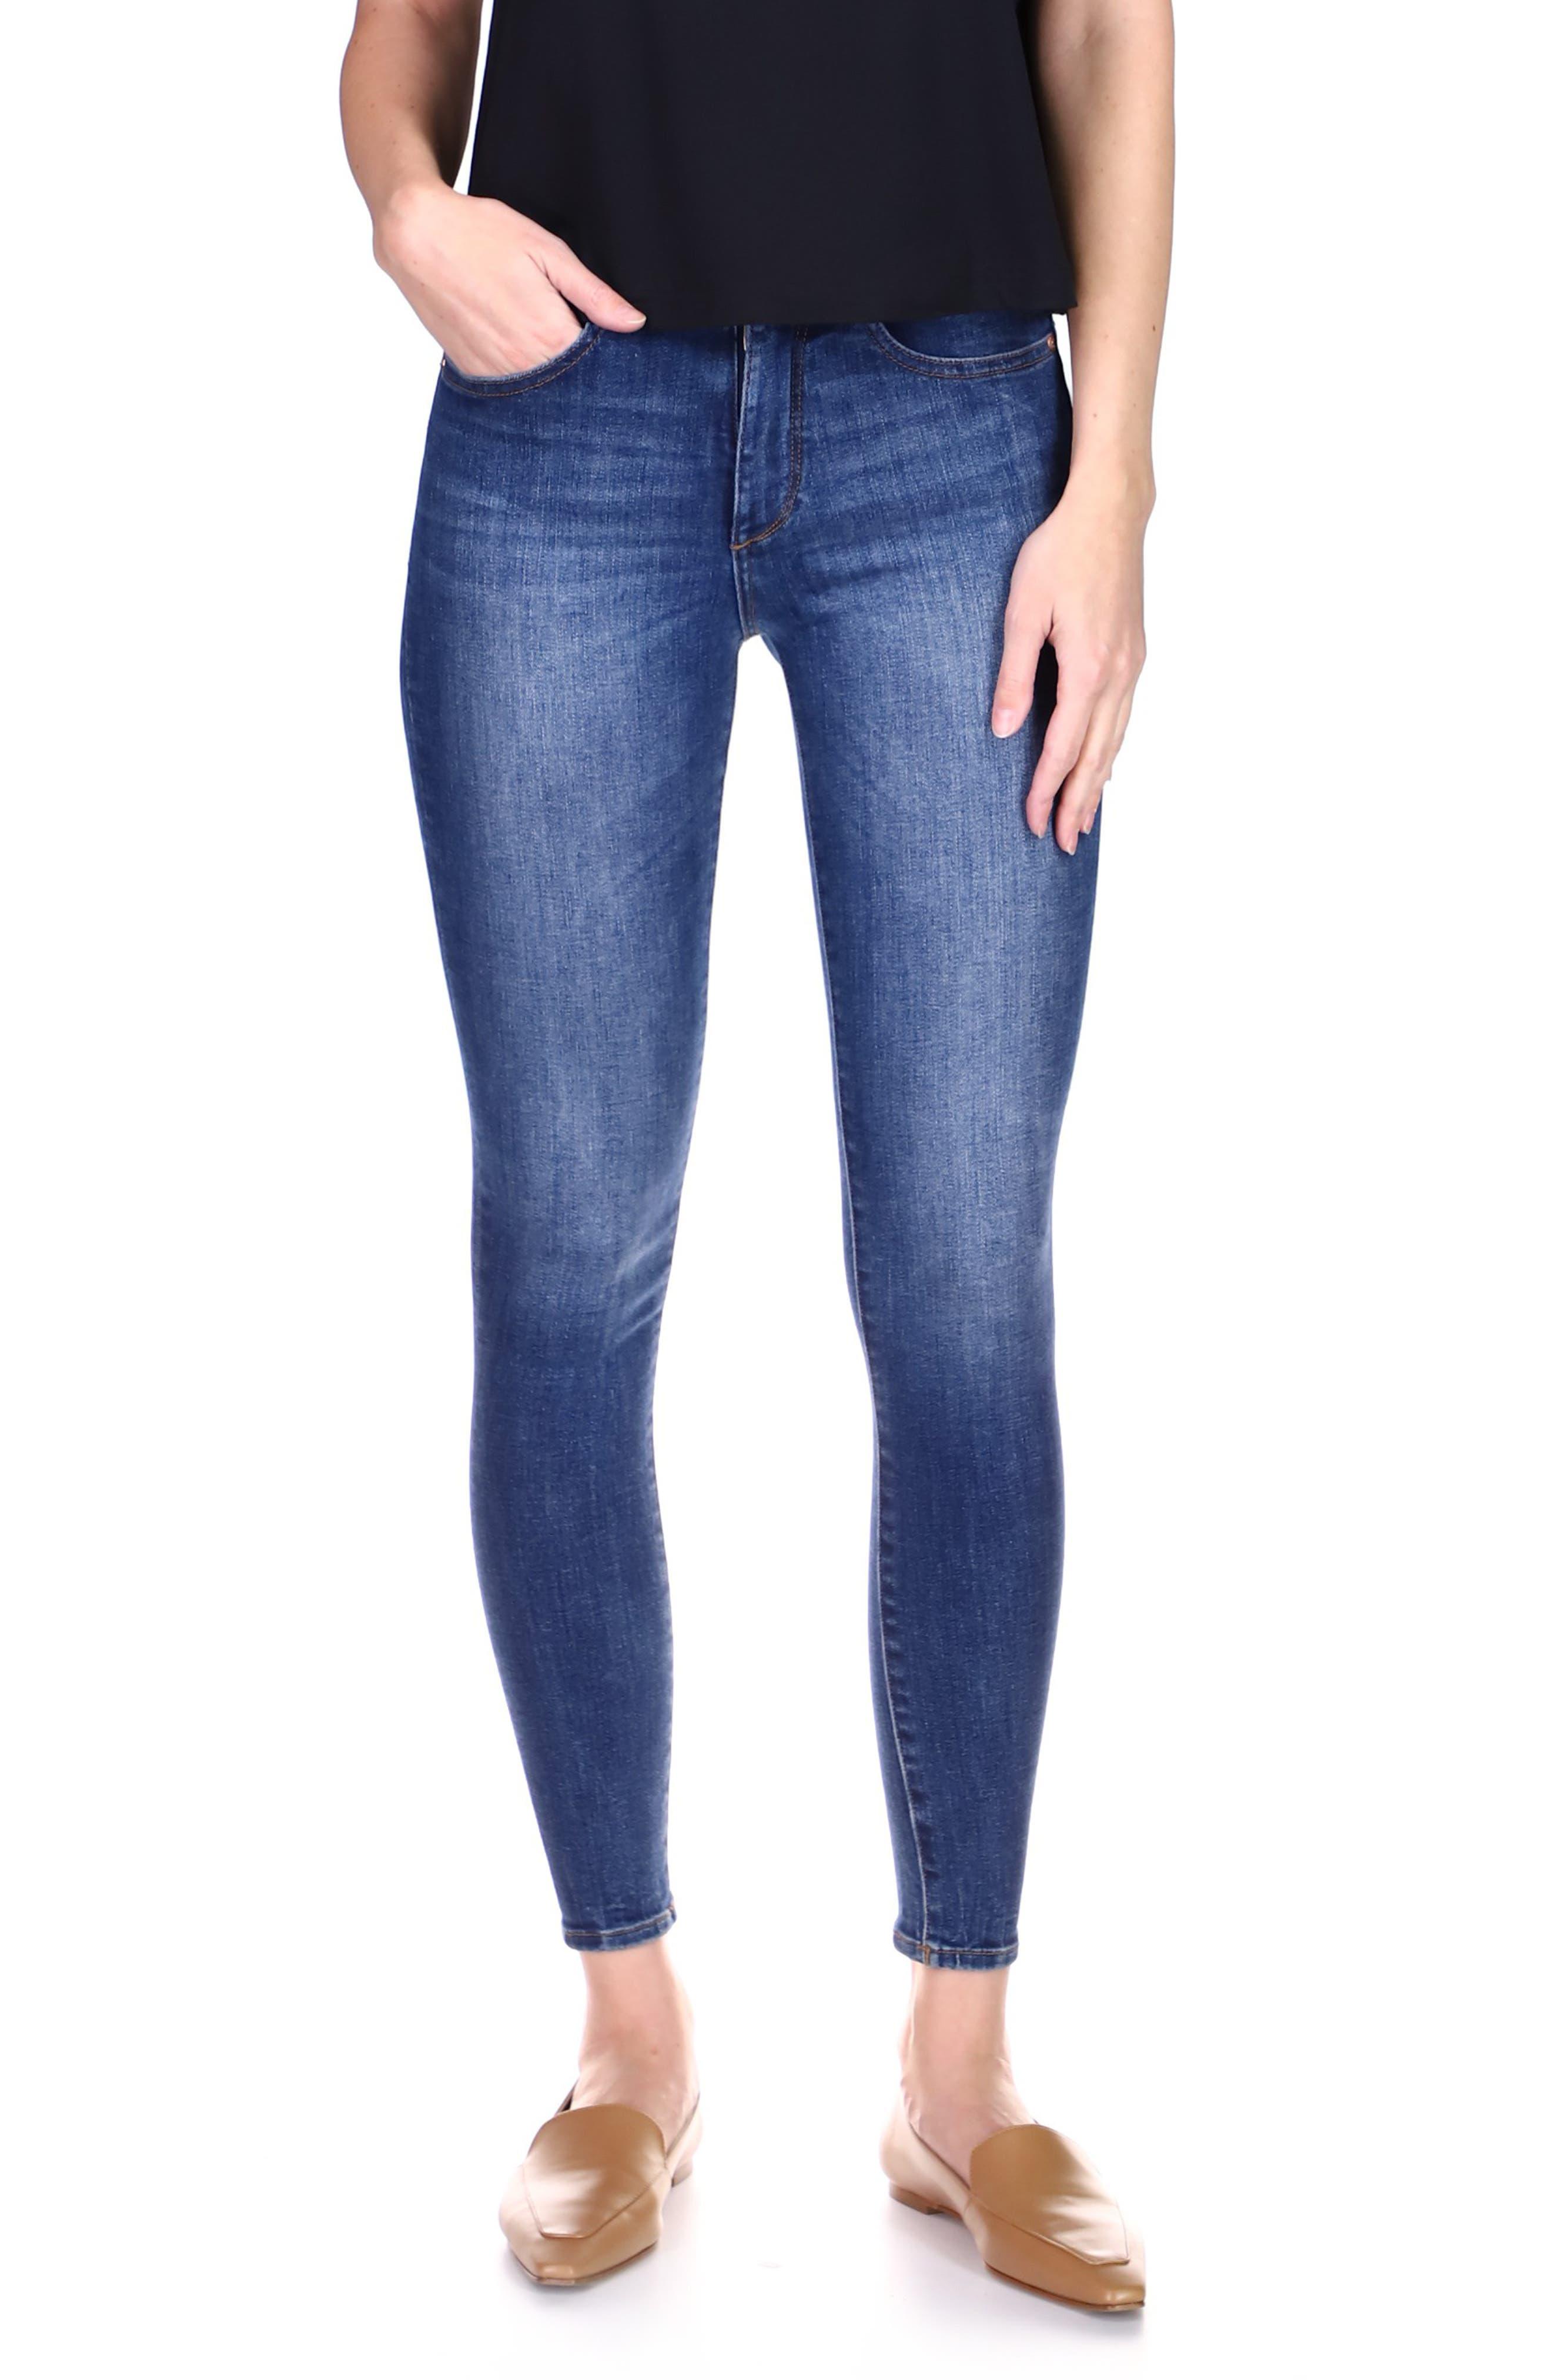 1961 Instasculpt Florence Ankle Skinny Jeans